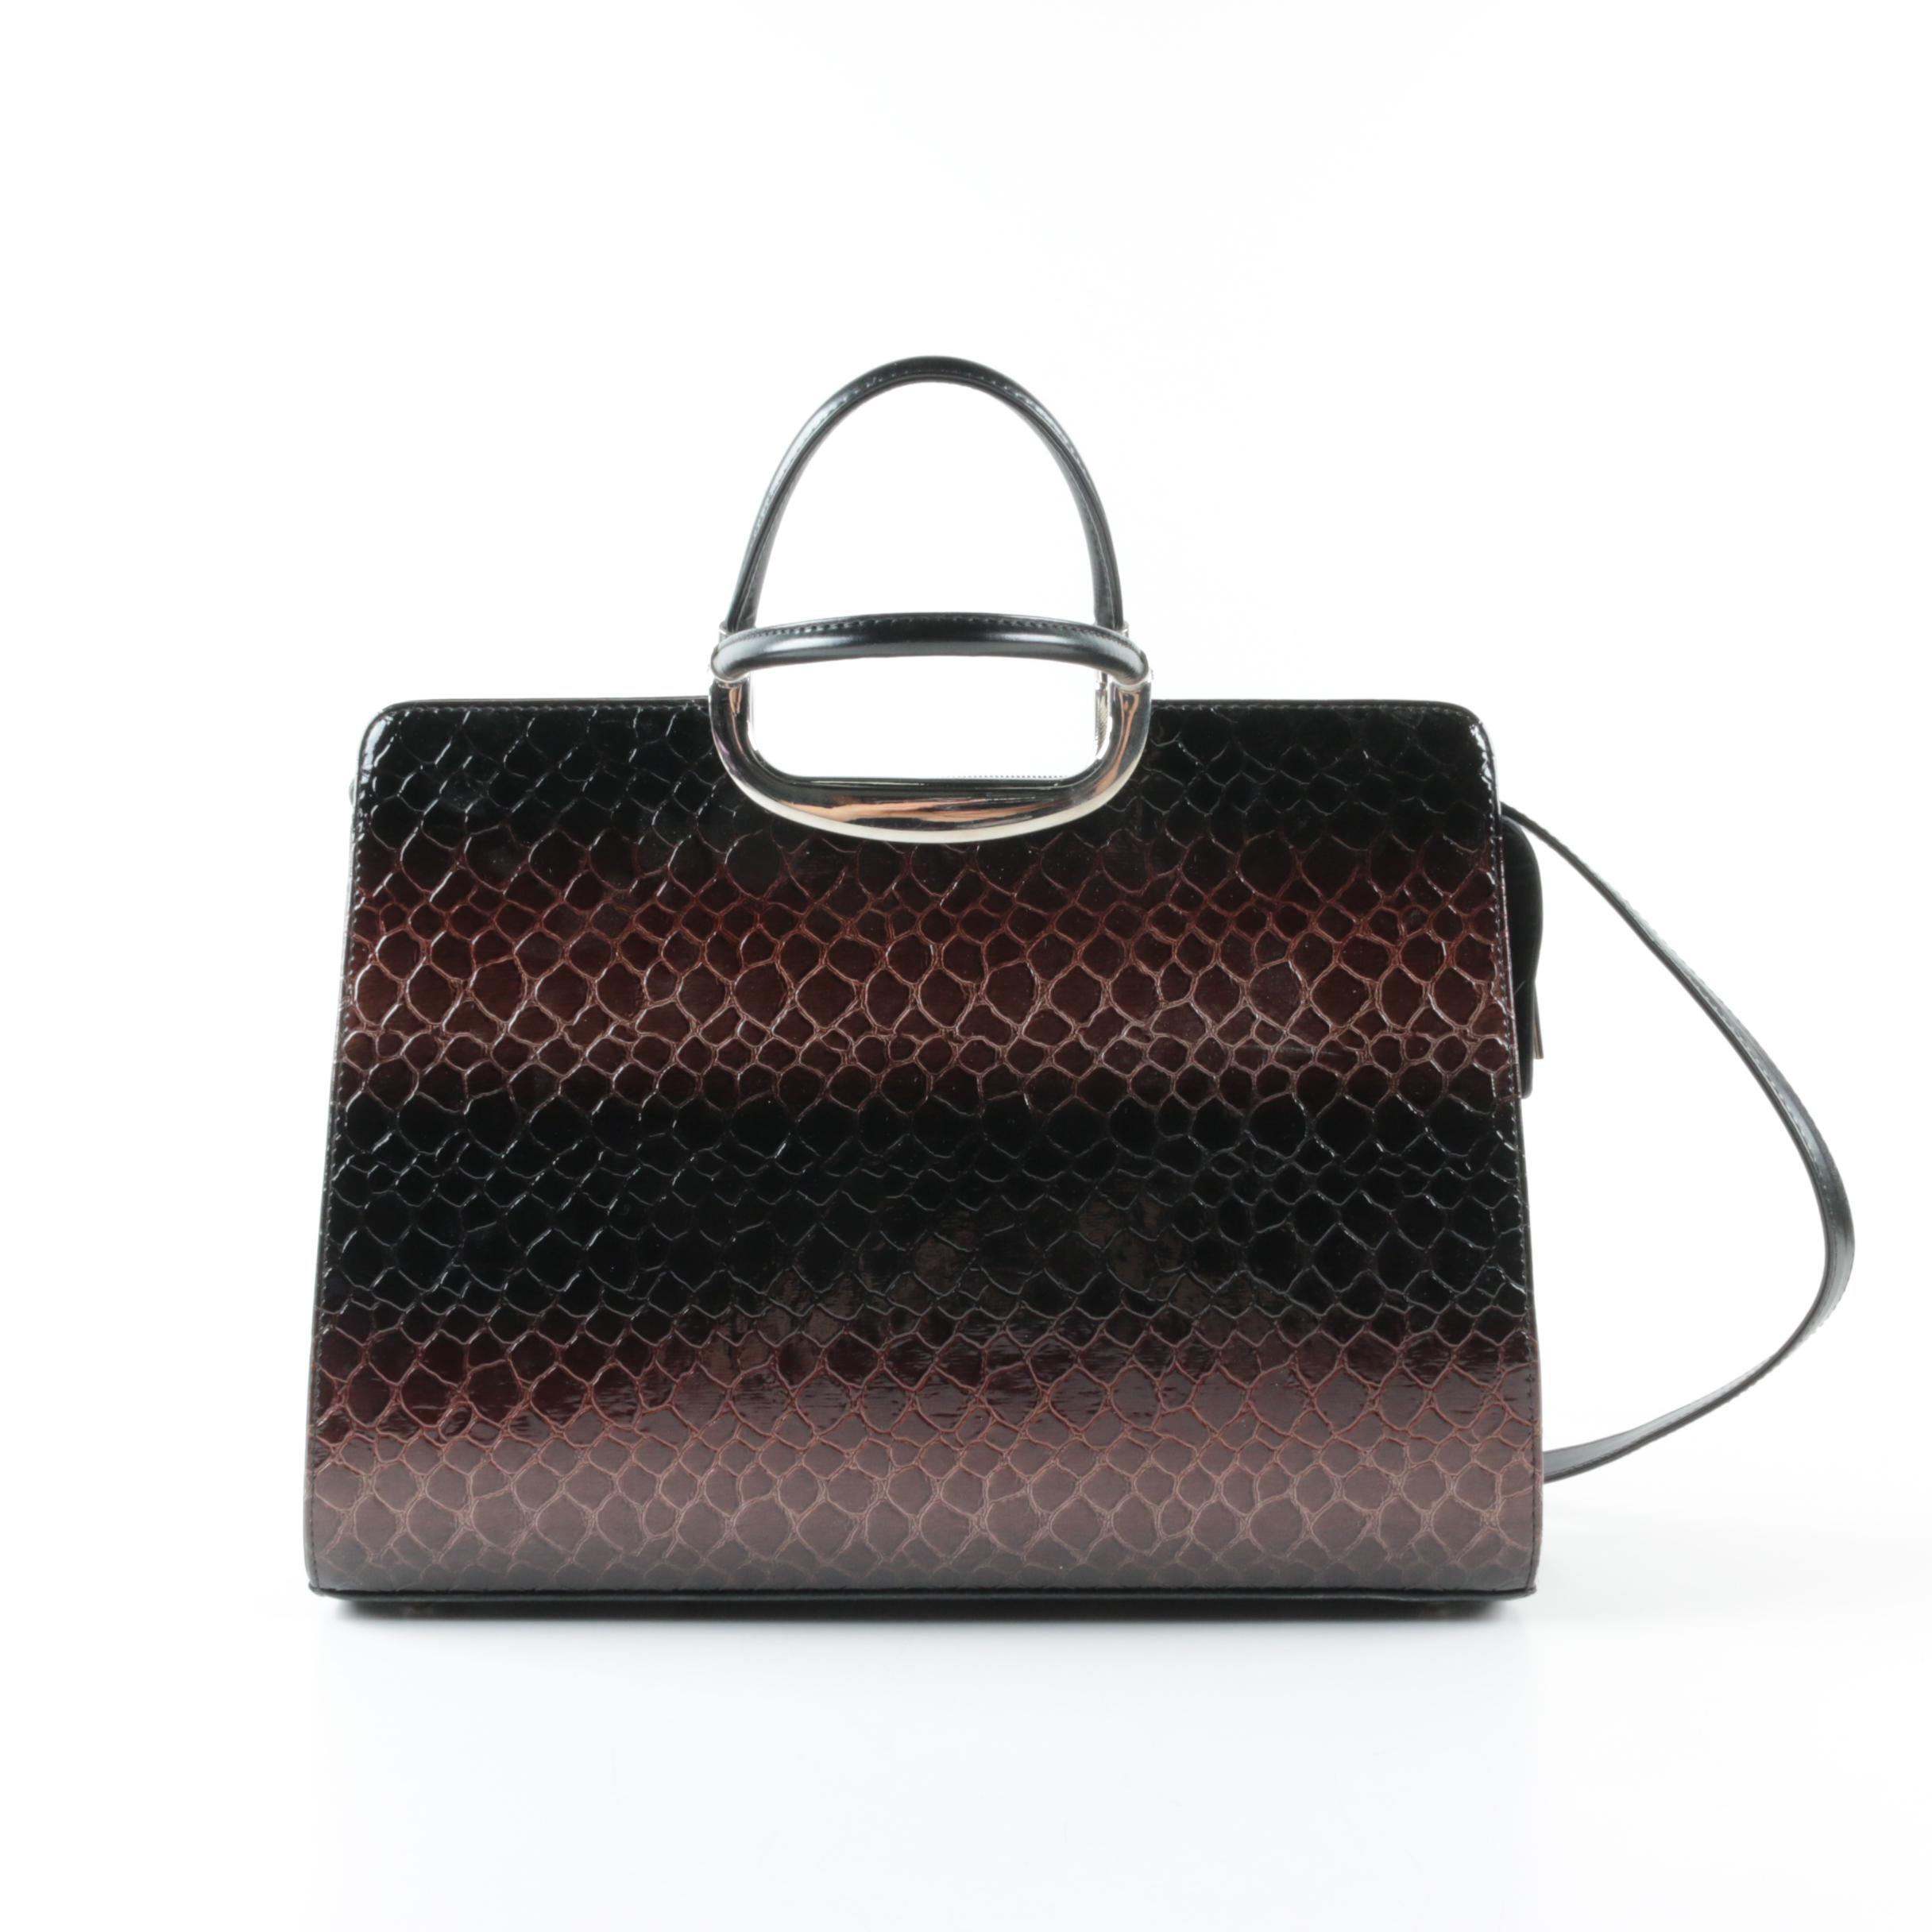 Brown and Black Ombré Embossed Leather Handbag